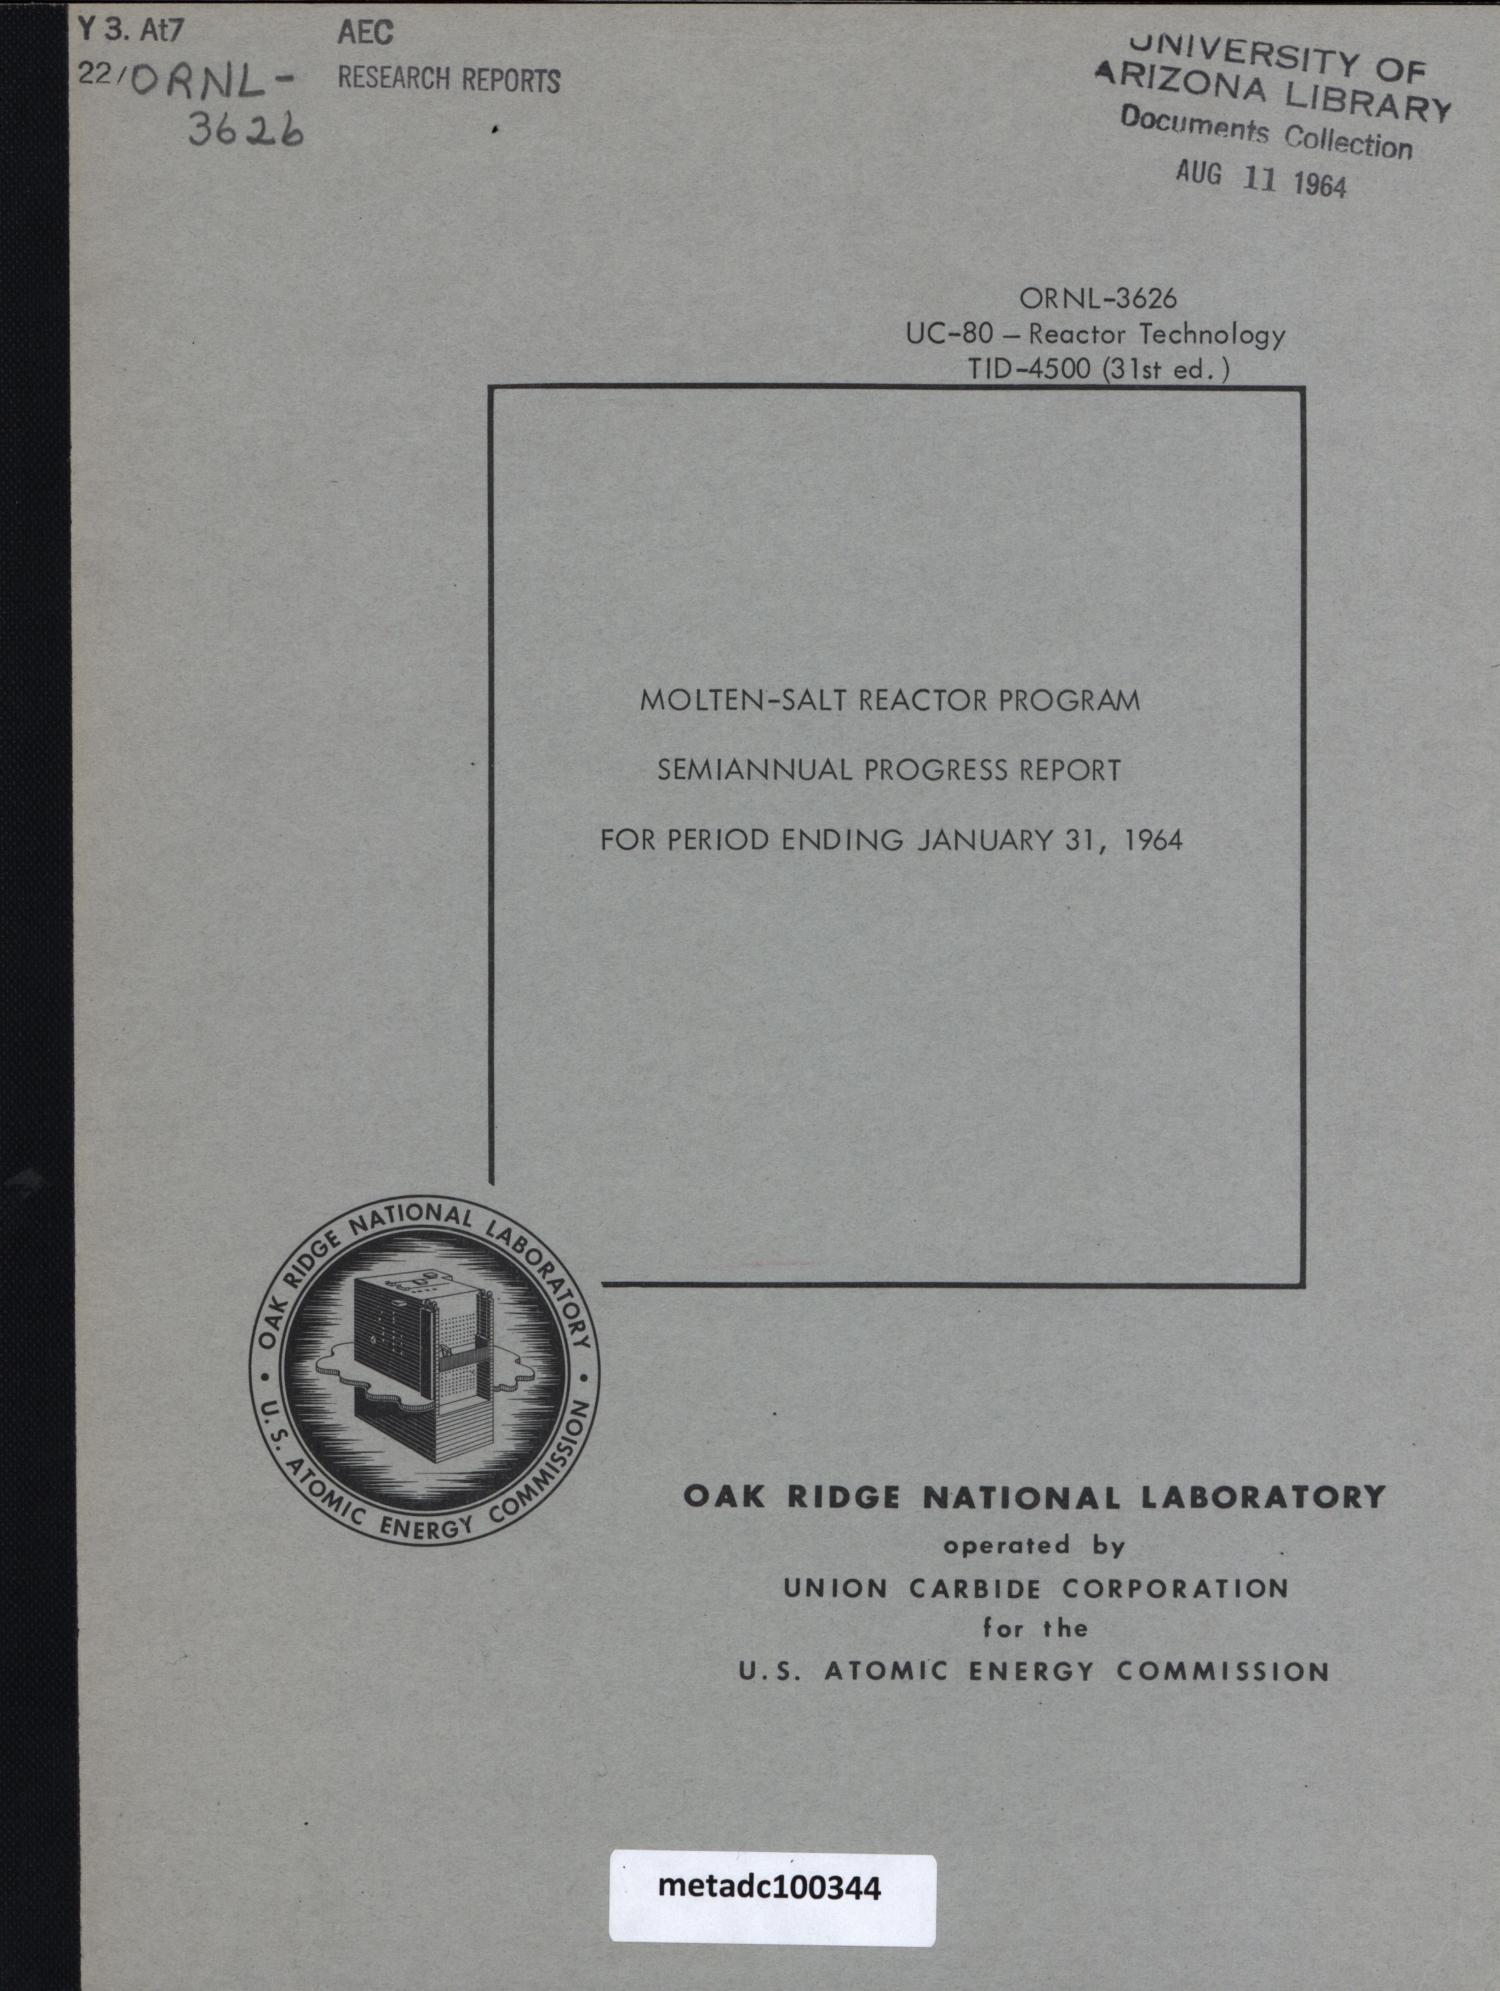 Molten-Salt Reactor Program Semiannual Progress Report